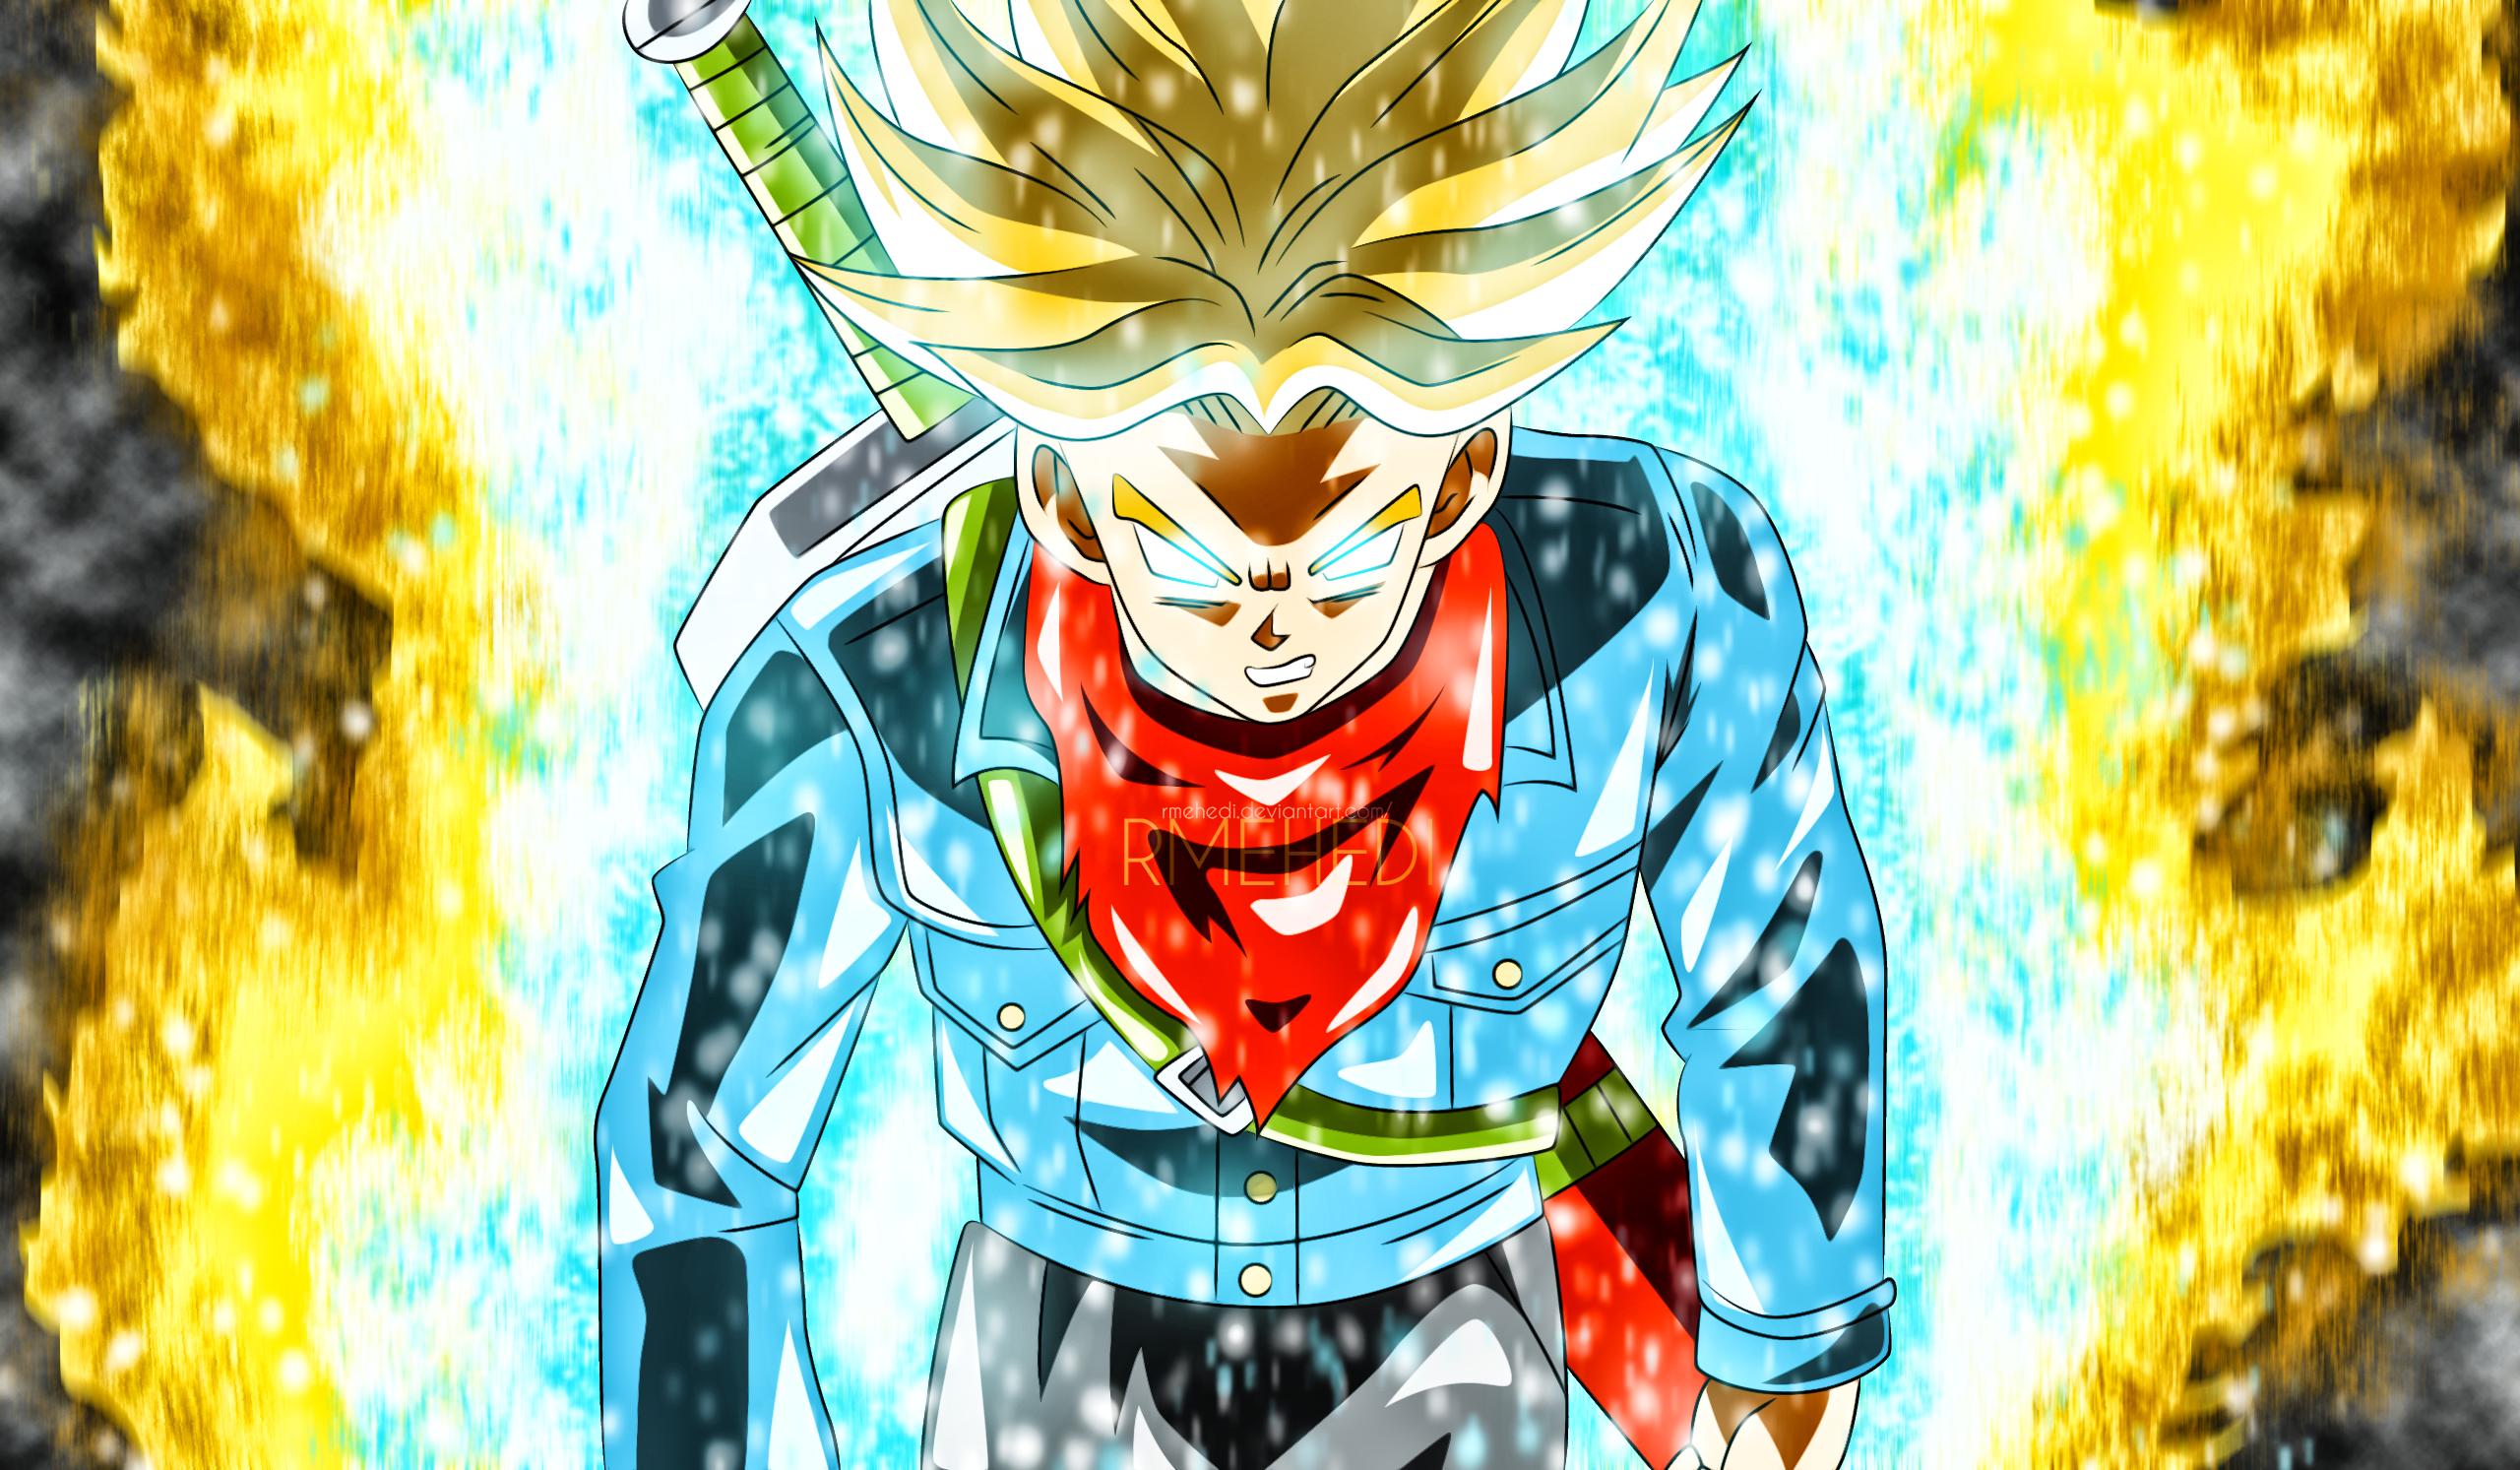 Future Trunks New Form V2 By Rmehedi Dakhii8 Png 2560 1493 Dragon Ball Super Wallpapers Anime Dragon Ball Super Dragon Ball Wallpapers